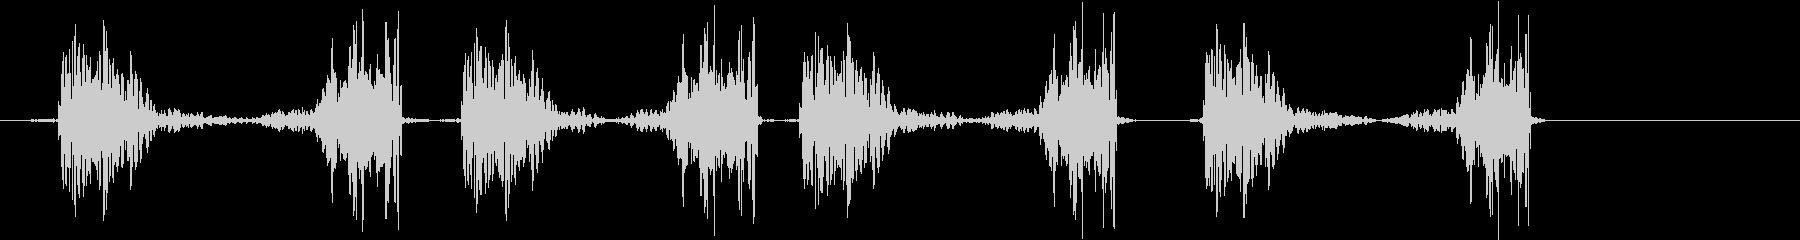 ジュクジュクジュクジュクの未再生の波形